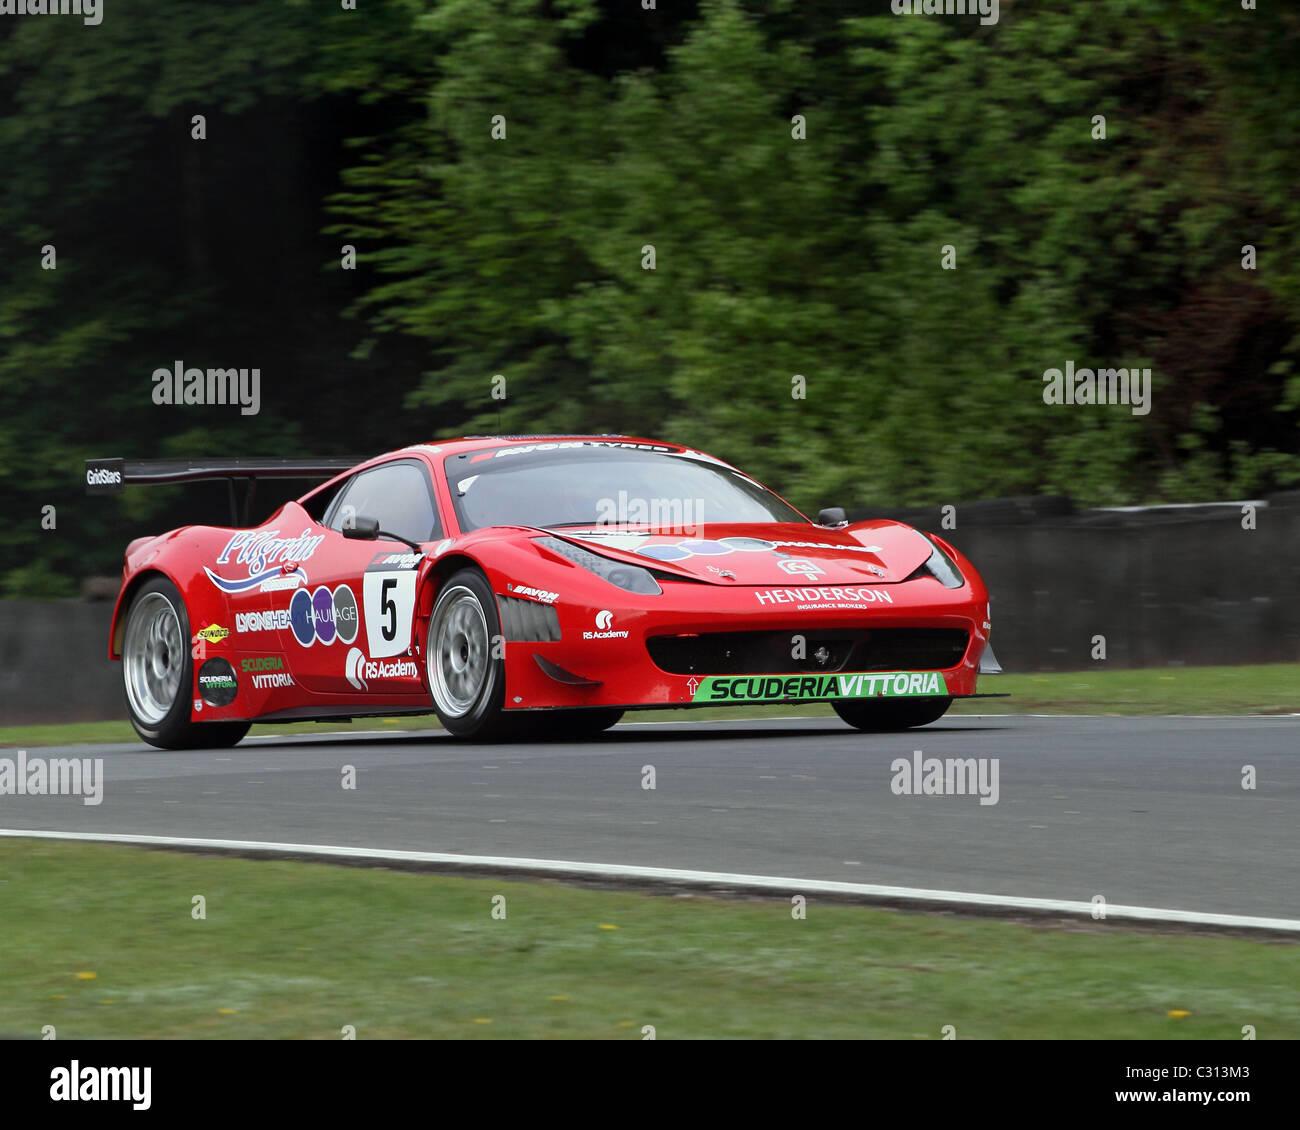 Ferrari 458 Gt3 Race Car In The 2011 British Gt Championship At